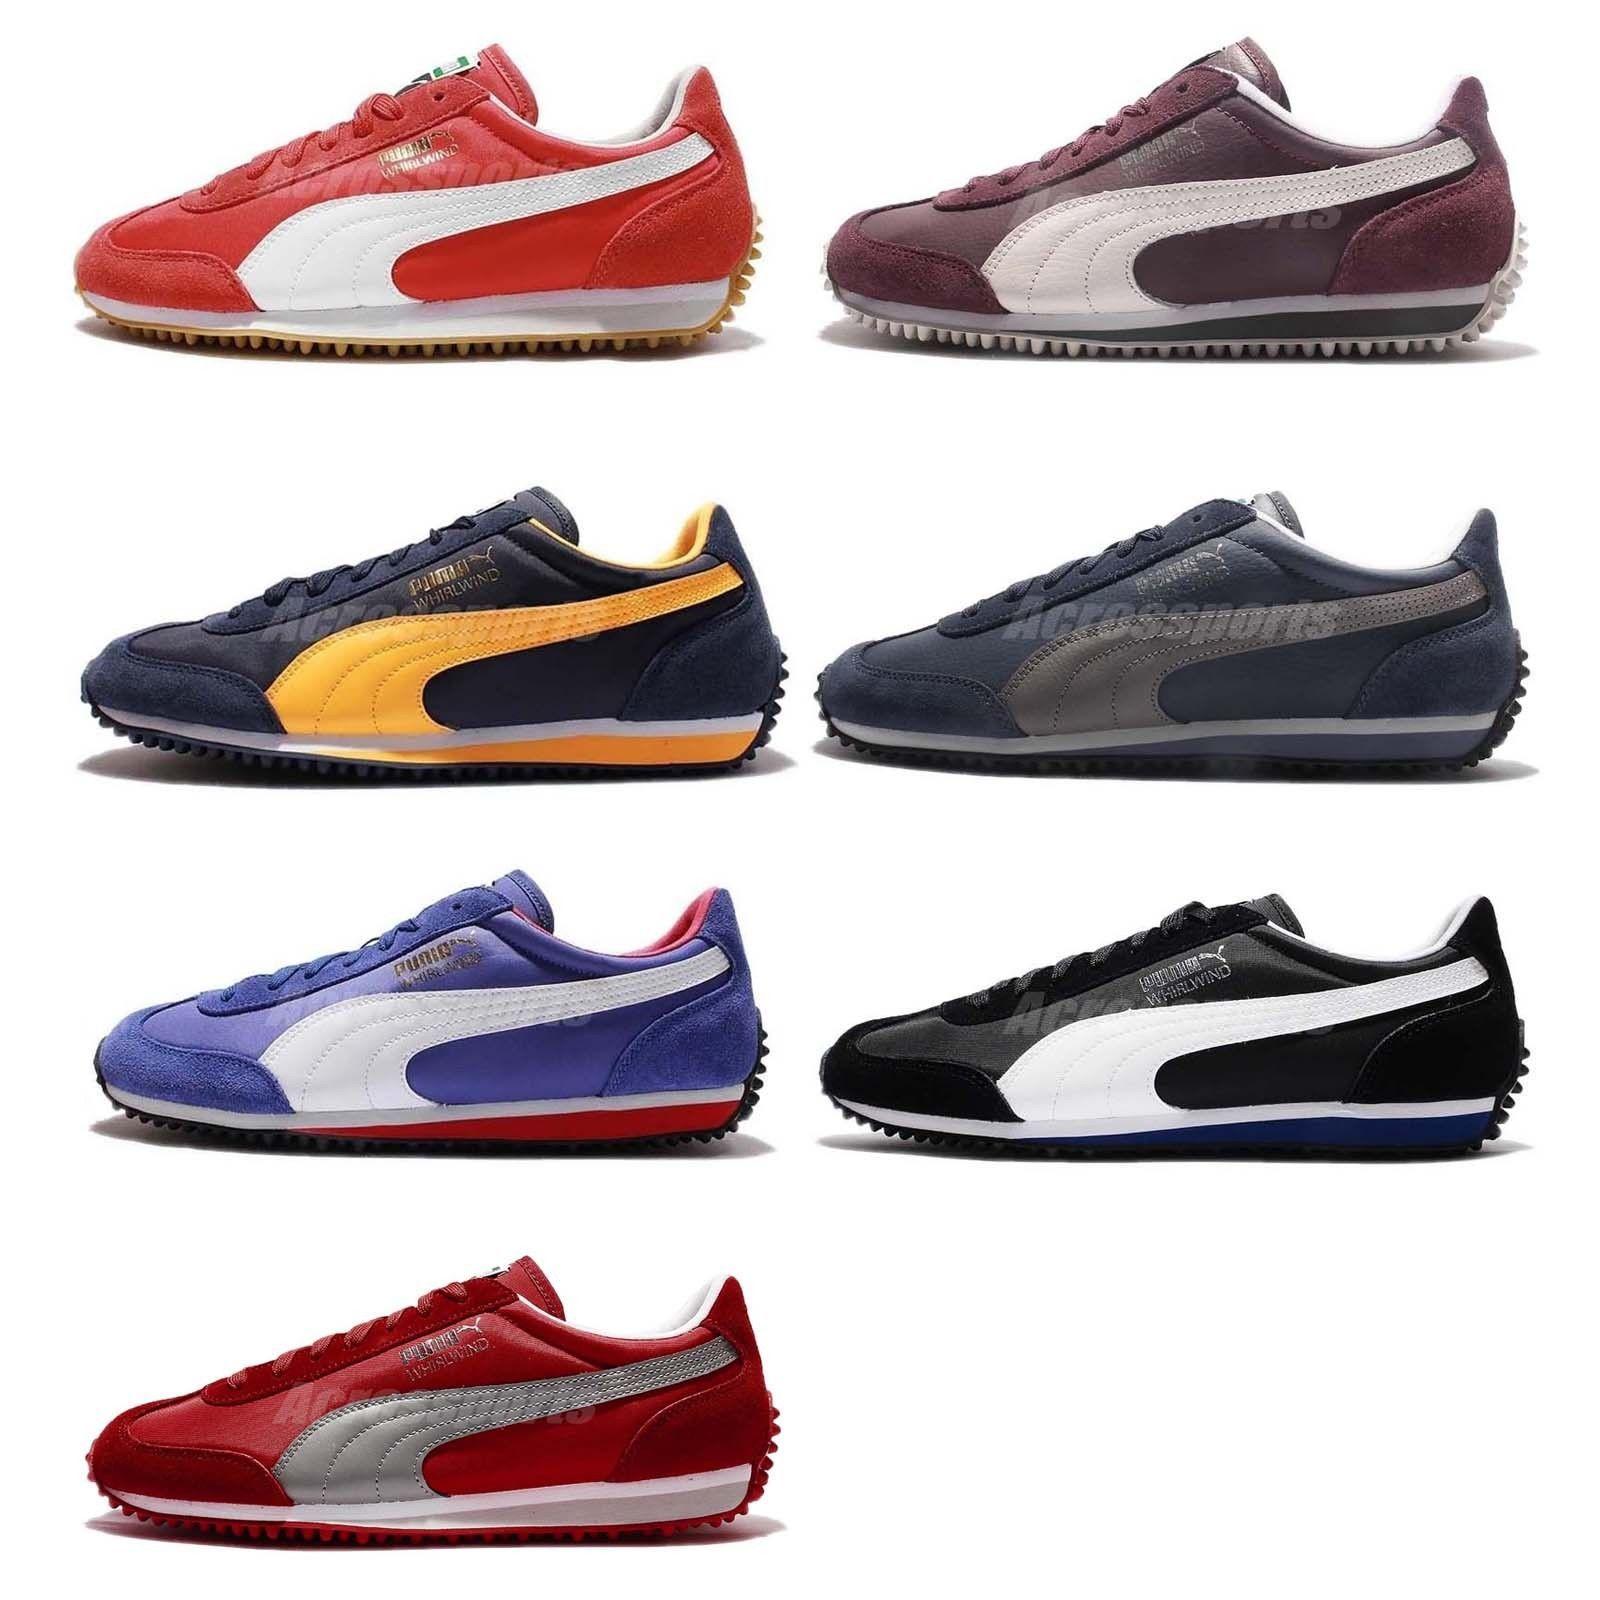 Puma Whirlwind Classic Mens Classic Casual Shoes Sneakers Pick 1 ... 49f5a61296e3c